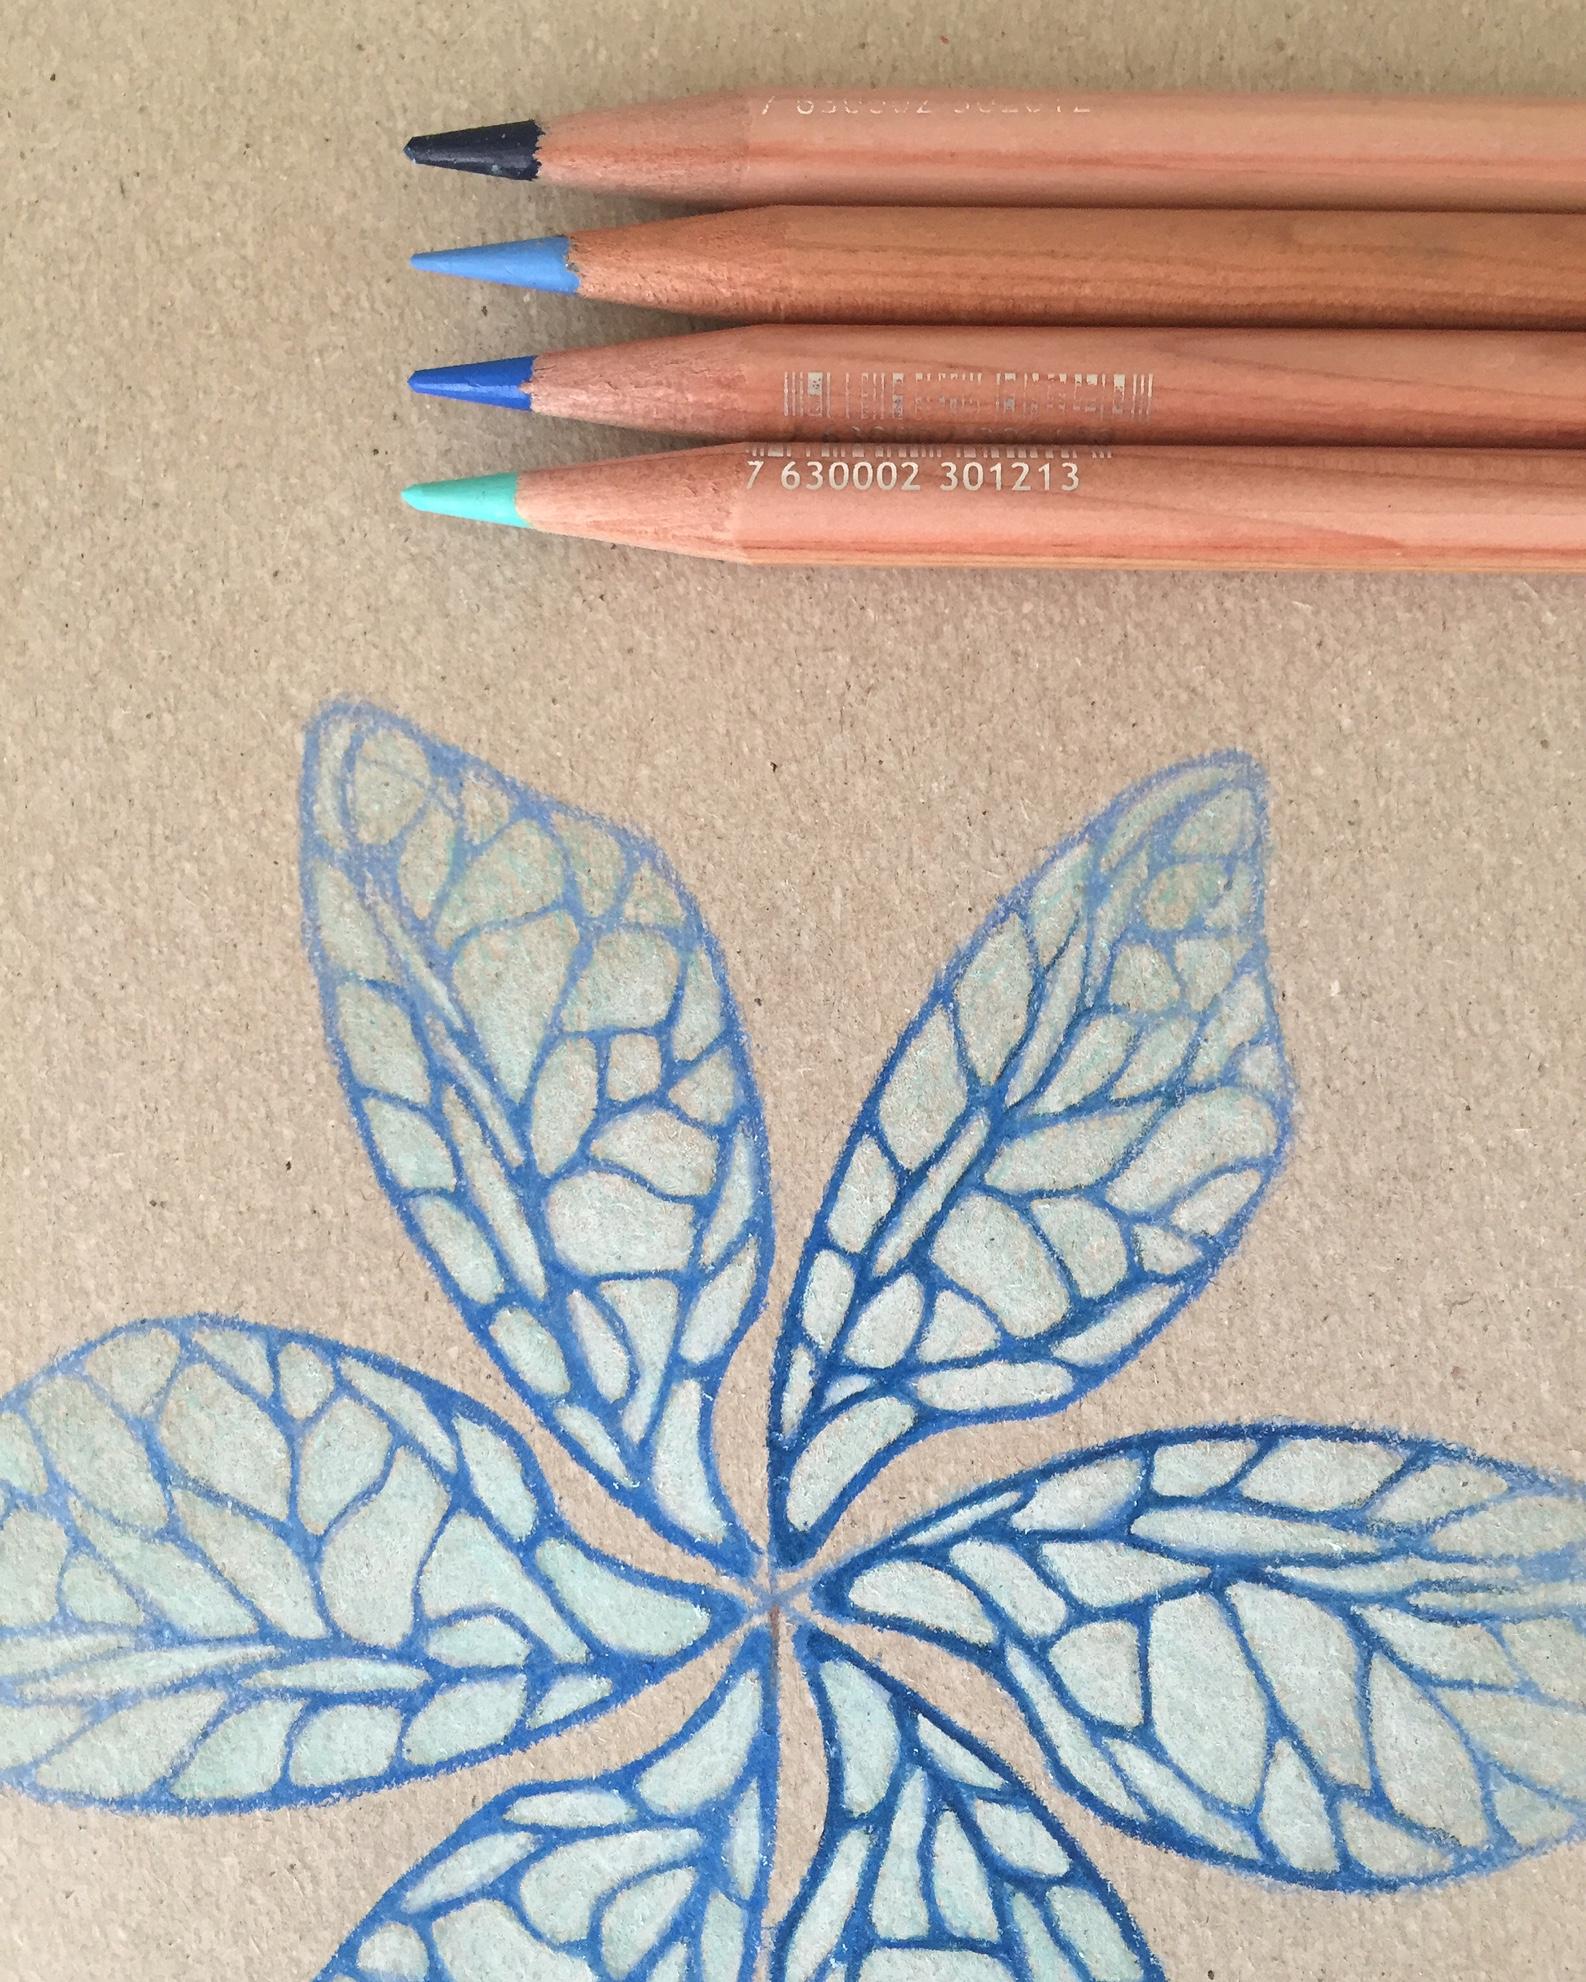 image Mandala mandala's drawing drawings tekening tekeningen art pencil potlood pencildrawing potloodtekening paper papier caranD'ache wings vleugels wing vleugel